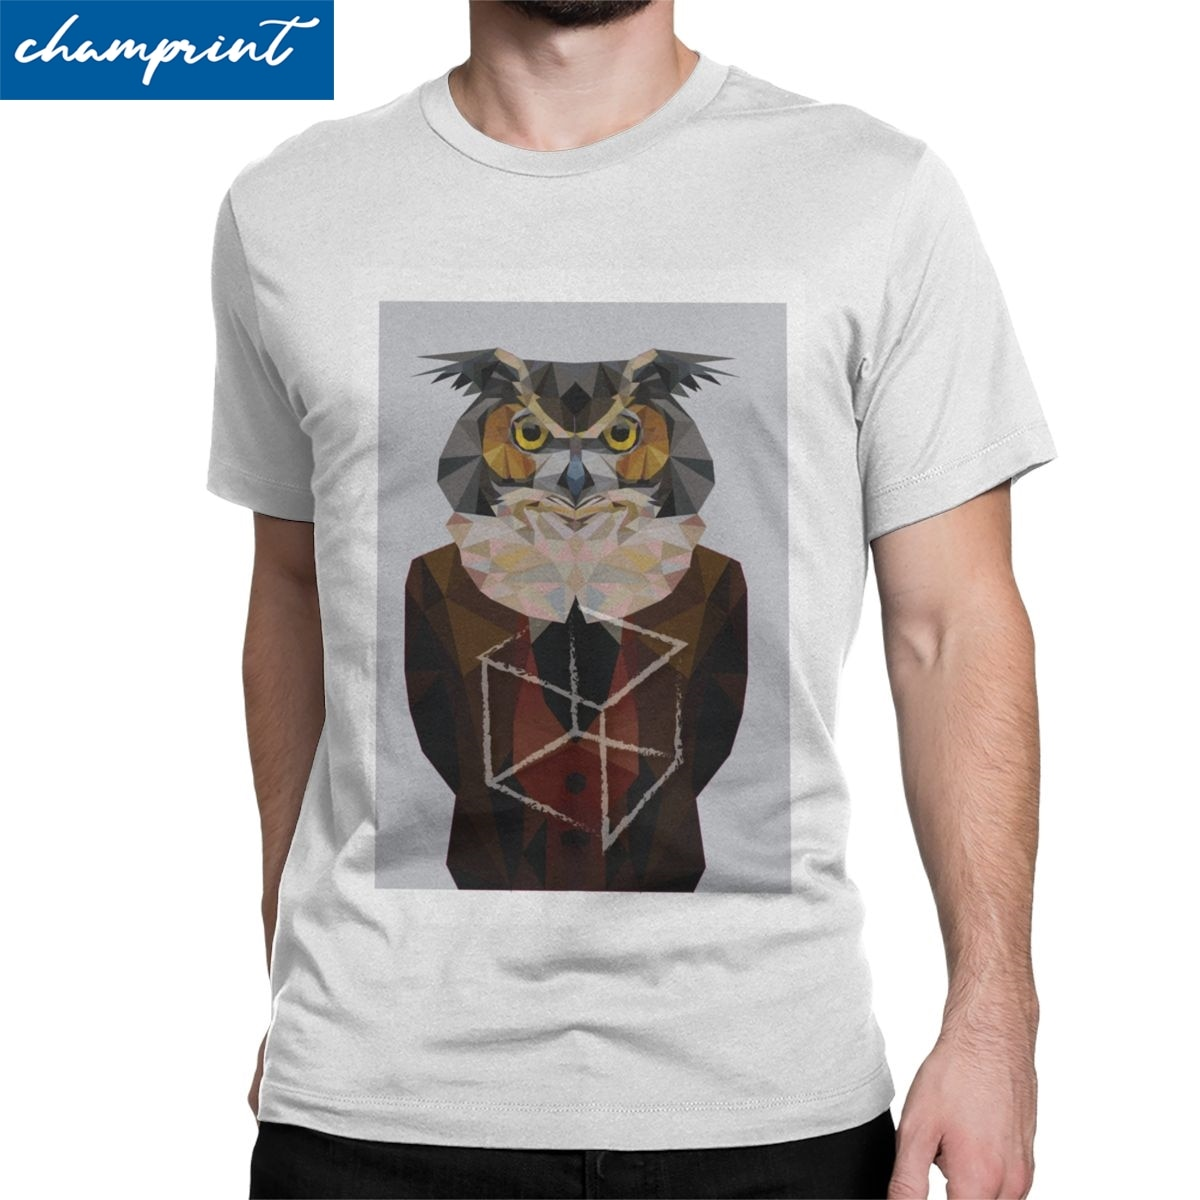 Camiseta de hombre de búho, camiseta divertida de manga corta con cuello redondo, Camiseta de algodón puro, ideal como regalo